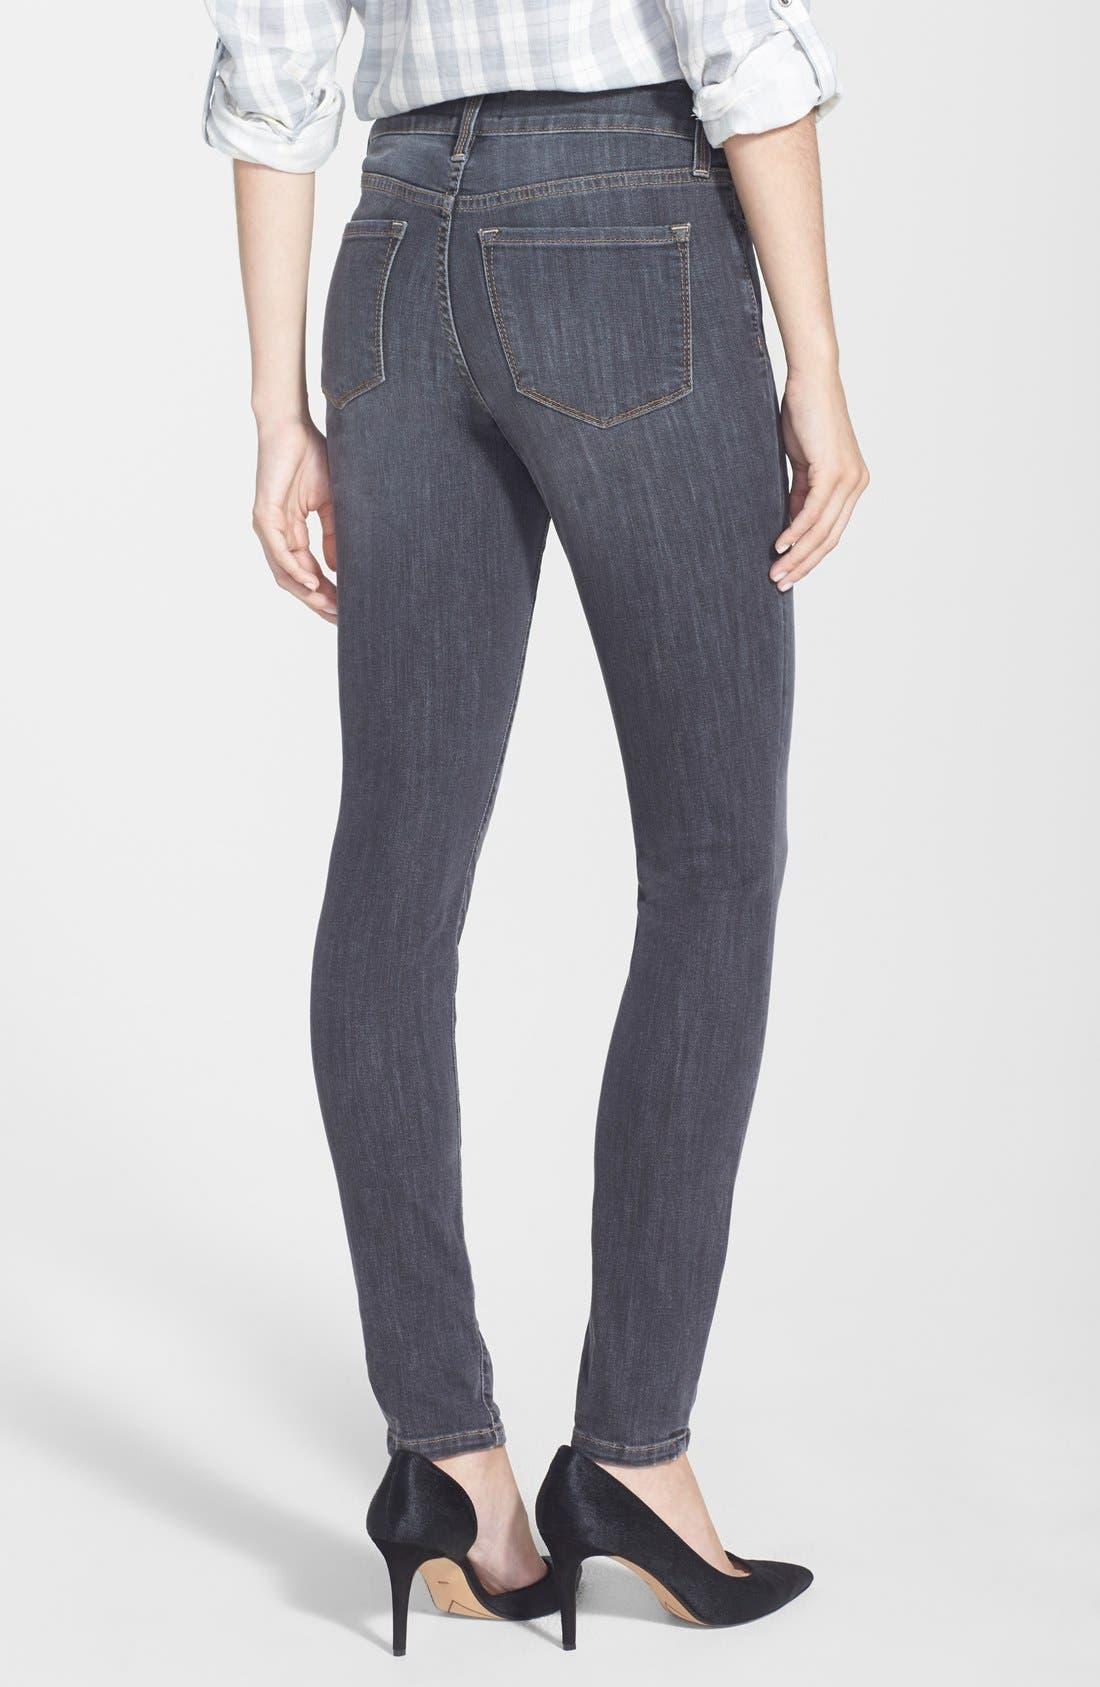 Alternate Image 2  - NYDJ 'Ami' Stretch Skinny Jeans (Dakota) (Regular & Petite)